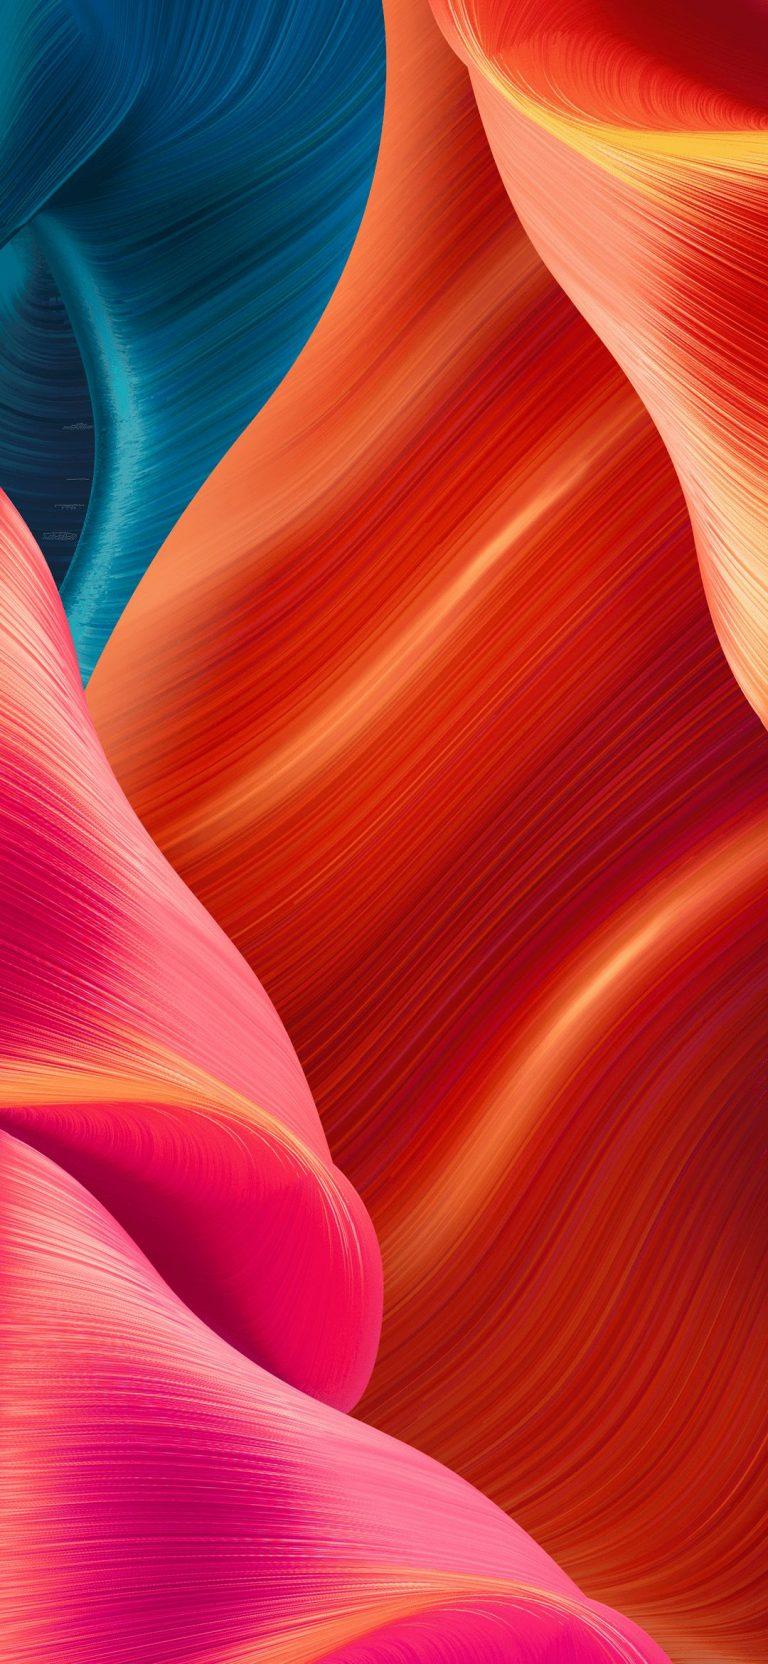 Realme Narzo 10 Wallpaper [1080x2340] - 11